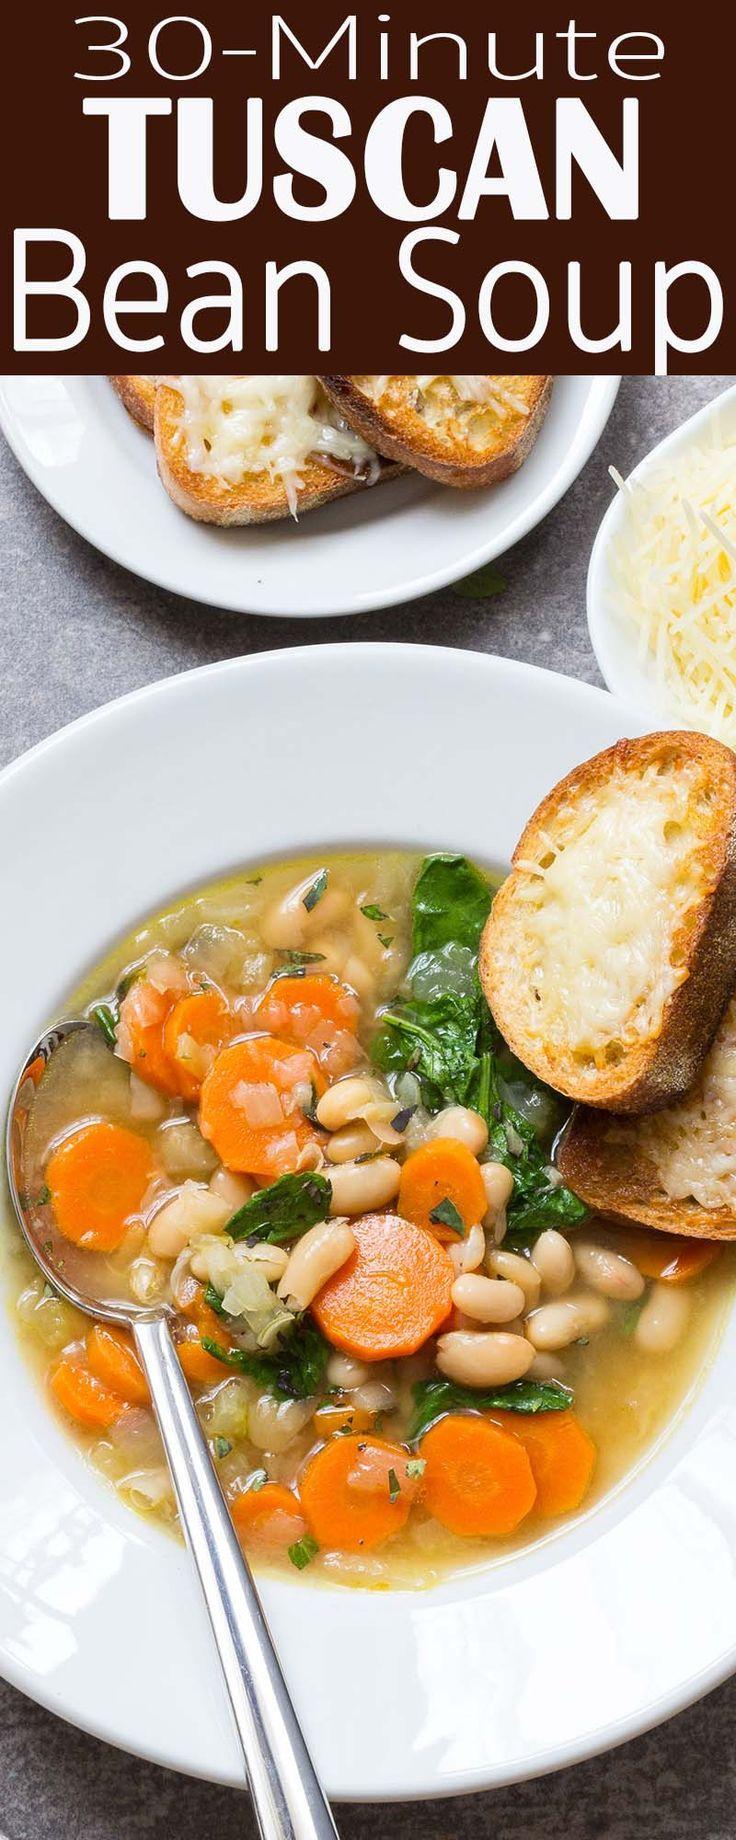 Vegetarian bean soup recipes easy